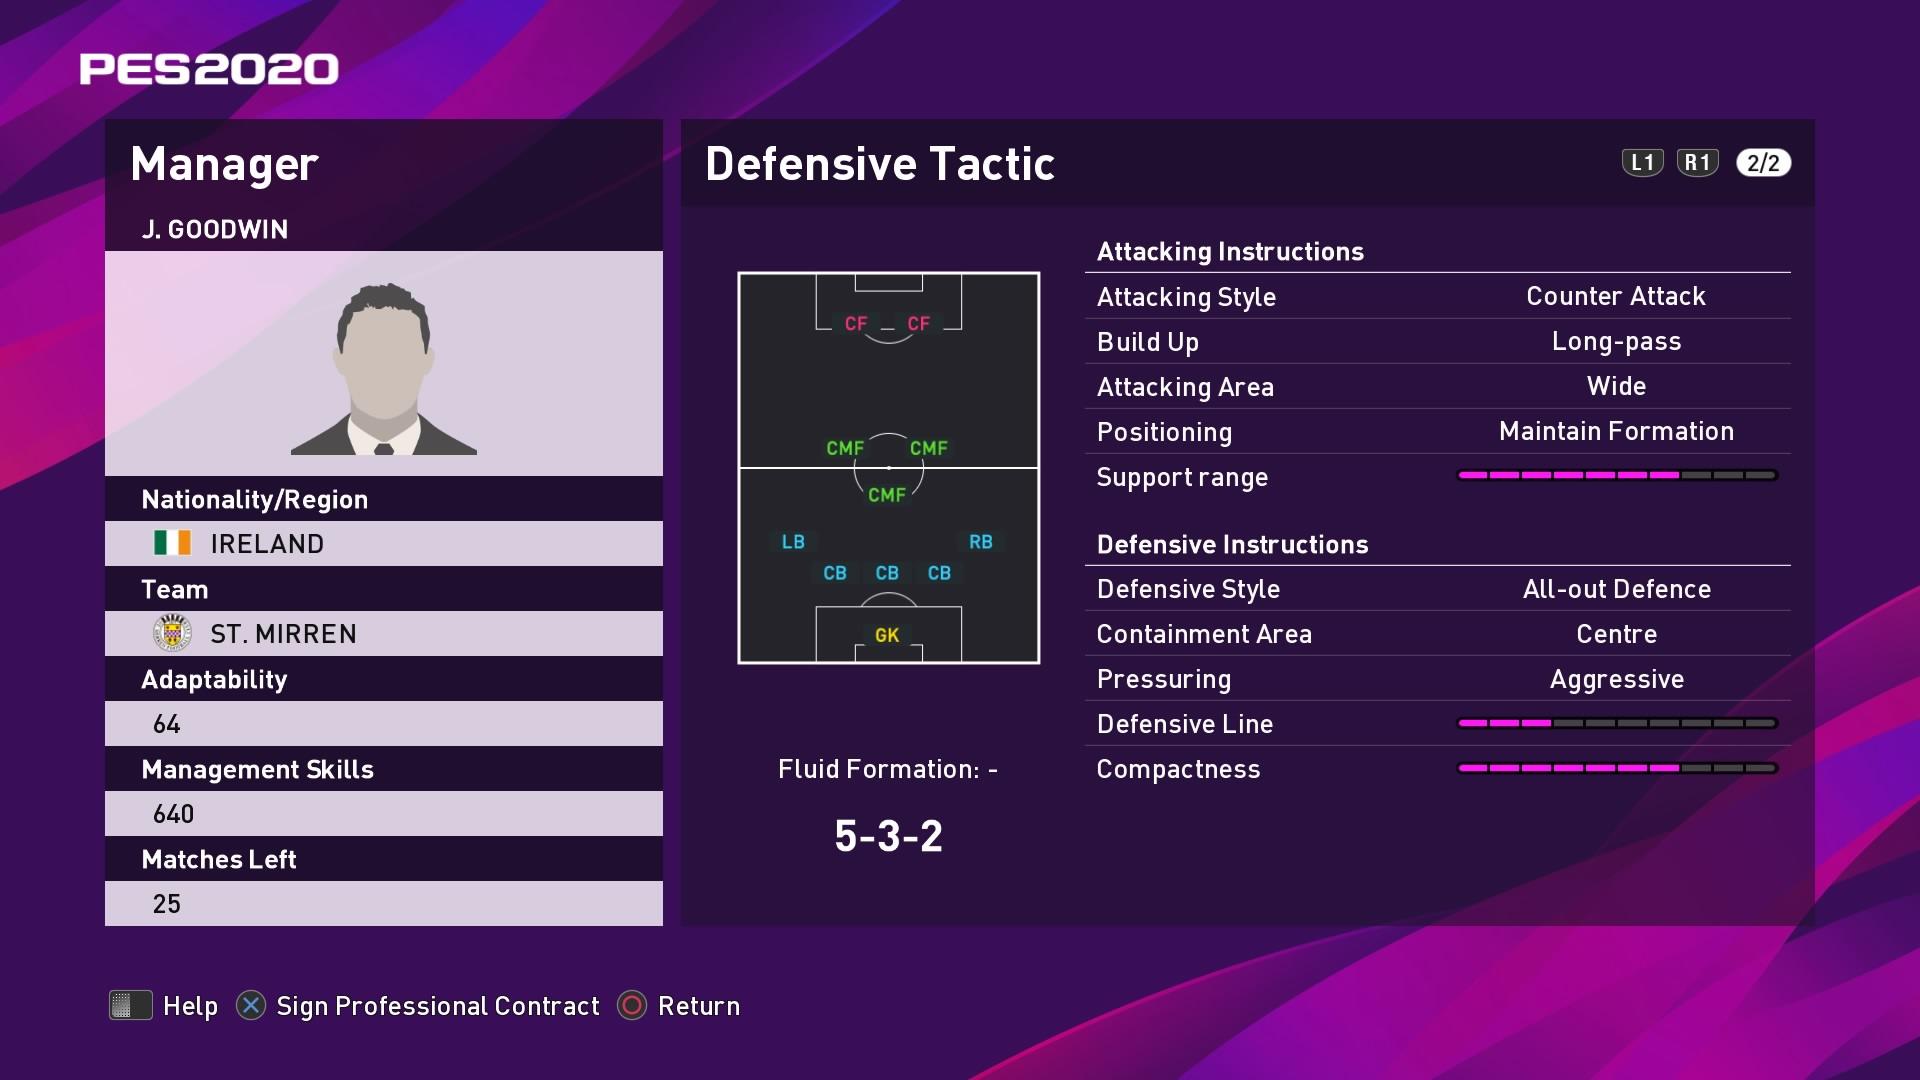 J. Goodwin (Jim Goodwin) Defensive Tactic in PES 2020 myClub